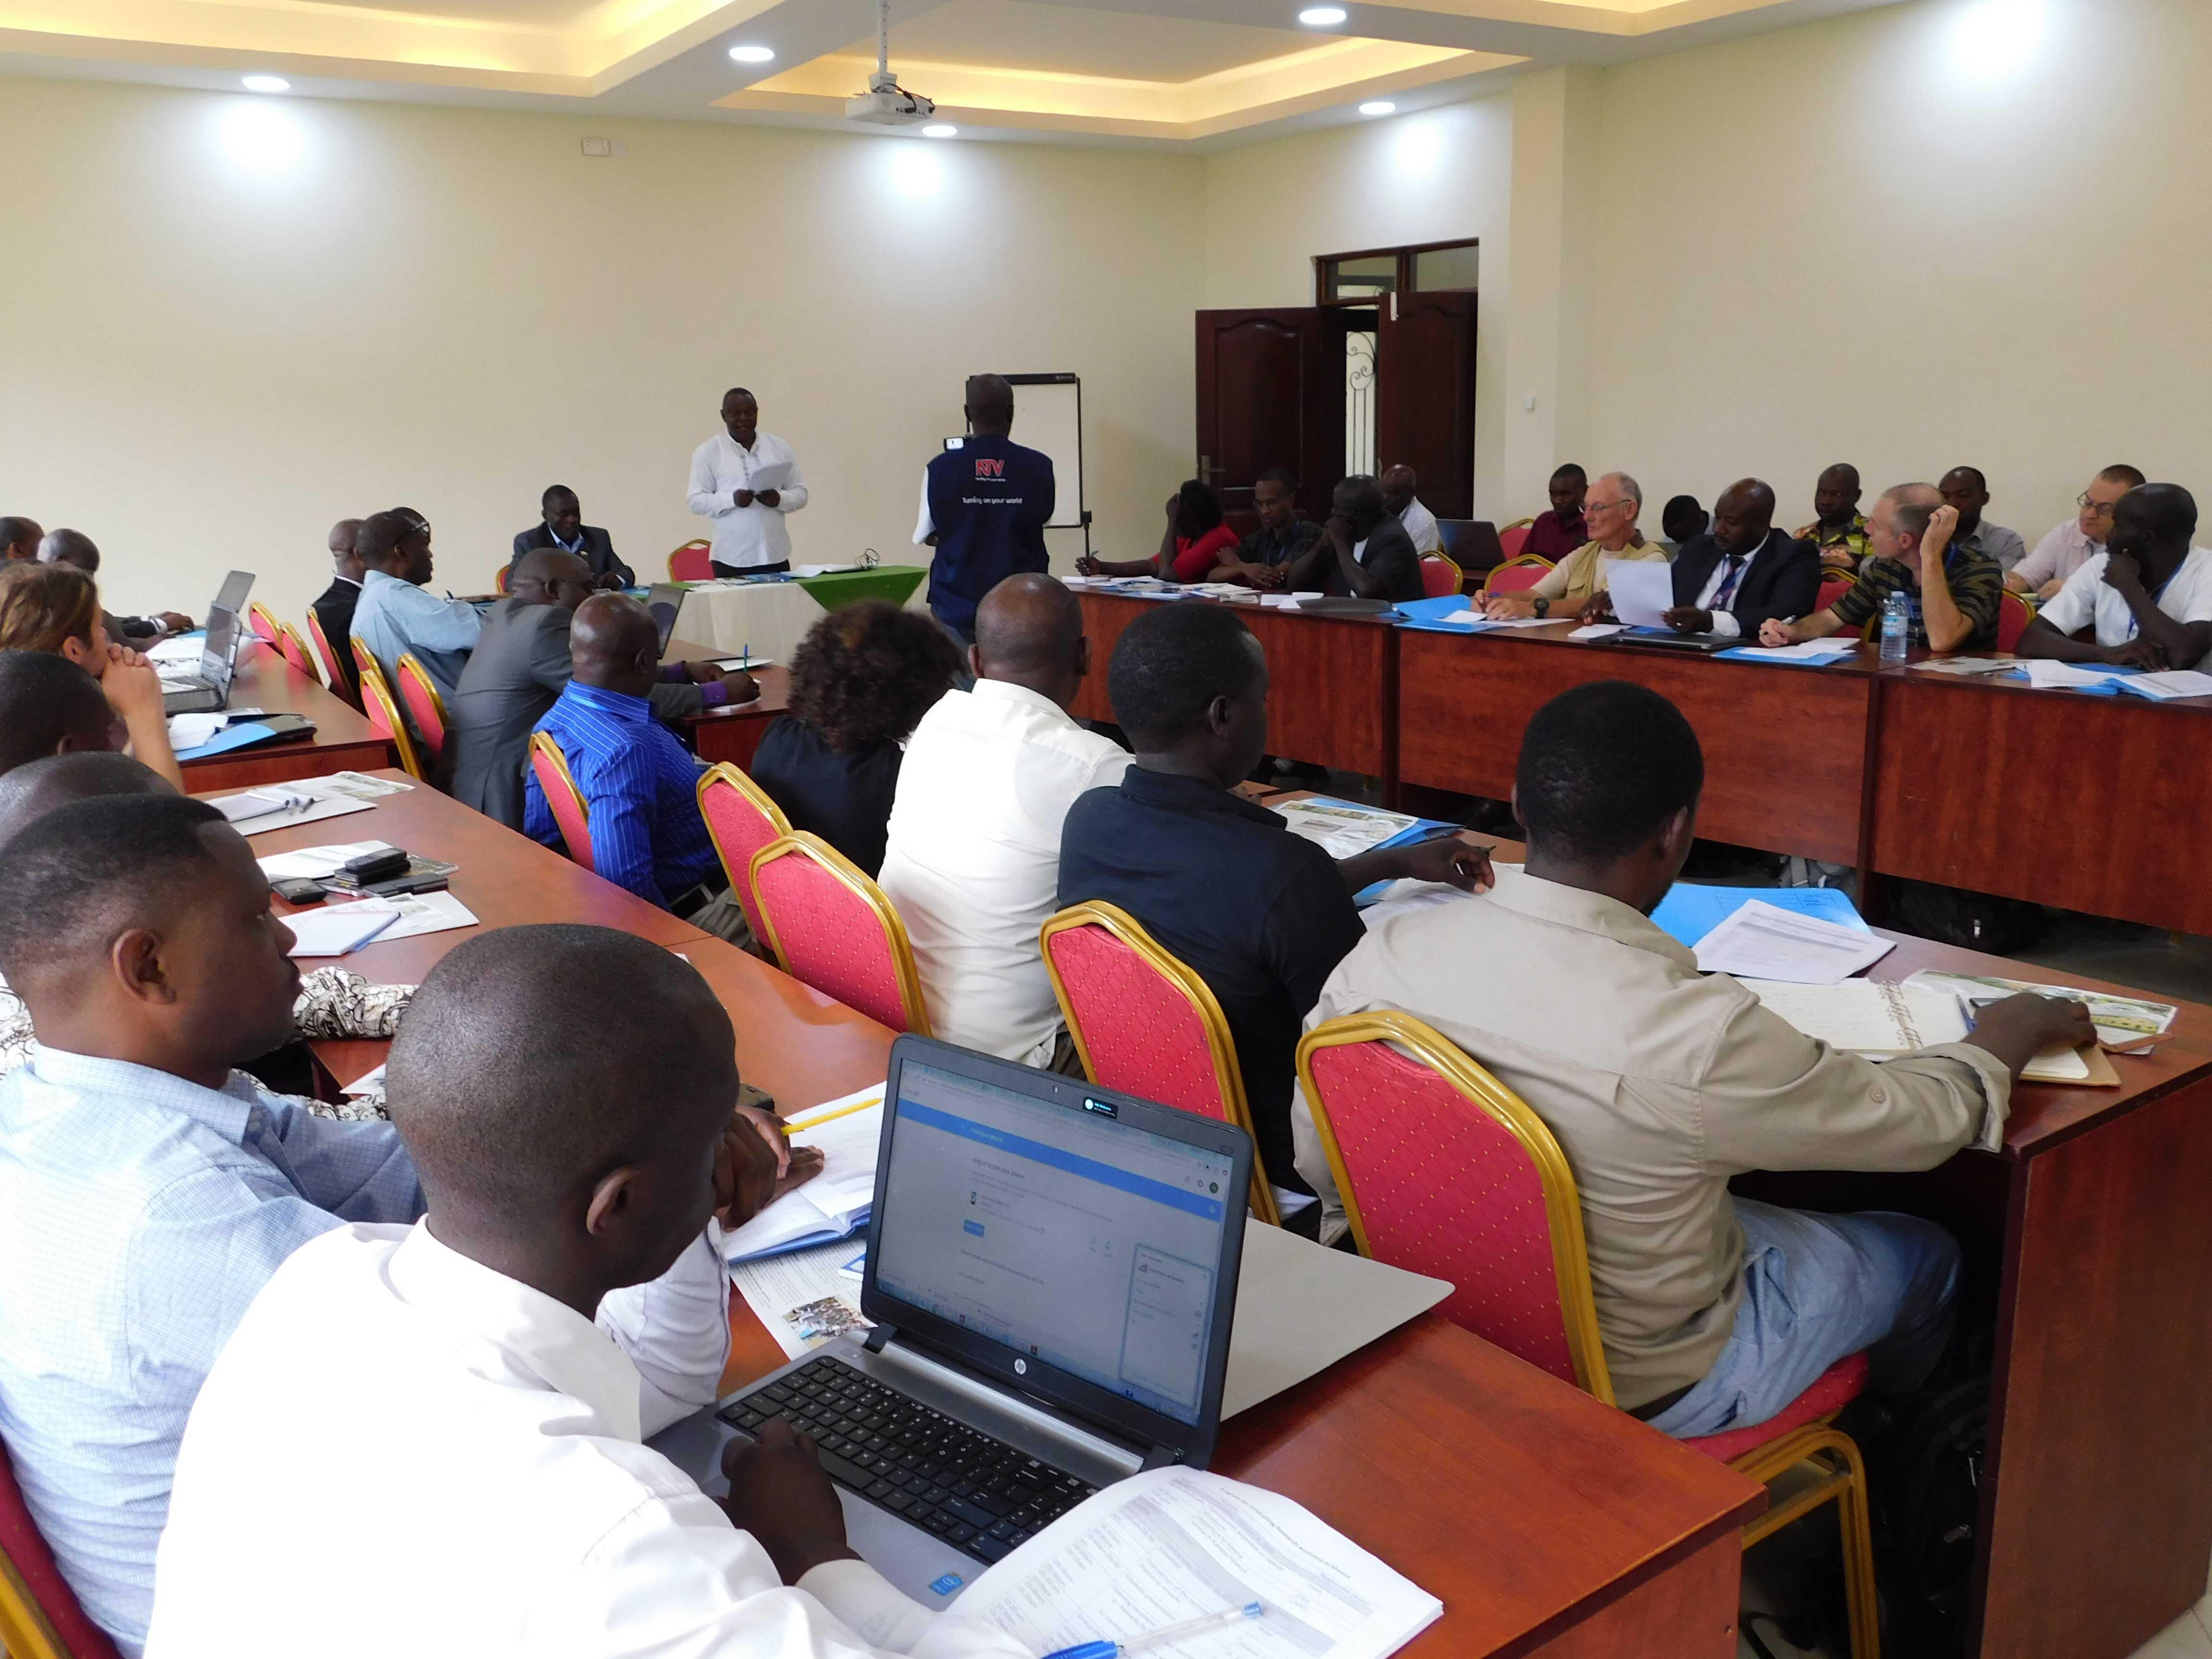 Uganda Wildlife Research Training Institute at a Wild Life Workshop